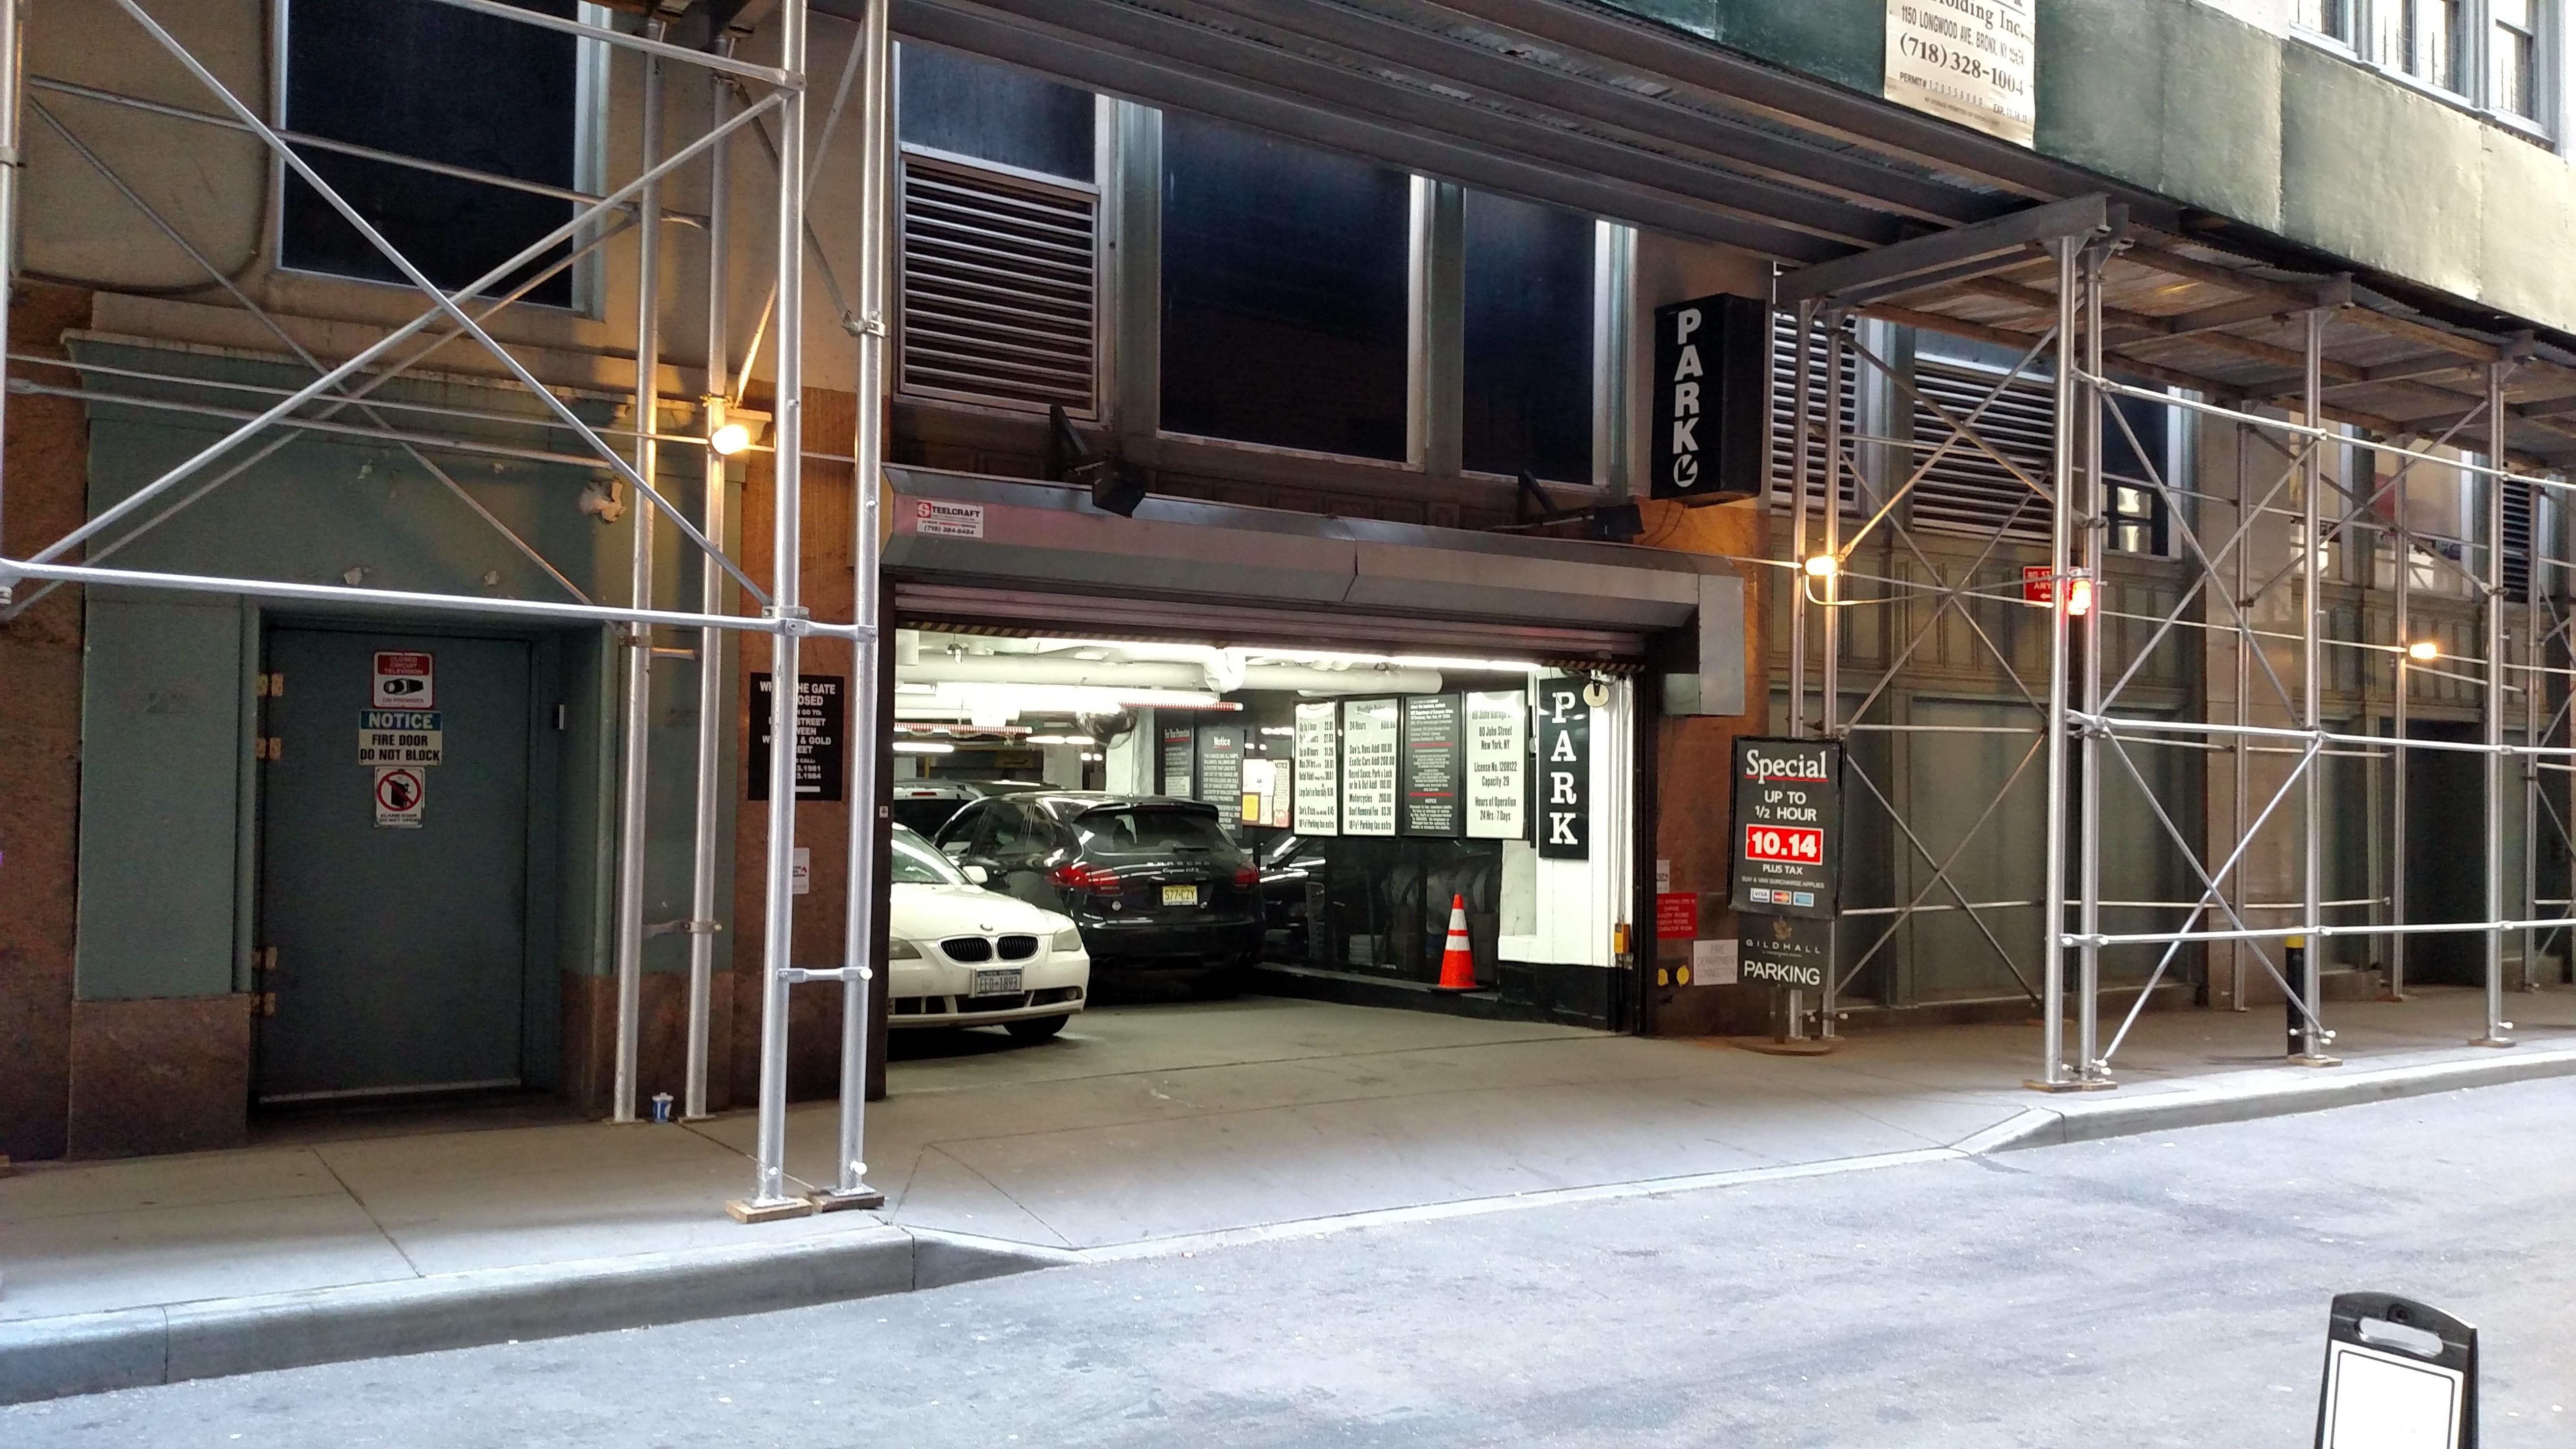 80 john st garage parking in new york parkme for New york city parking garage